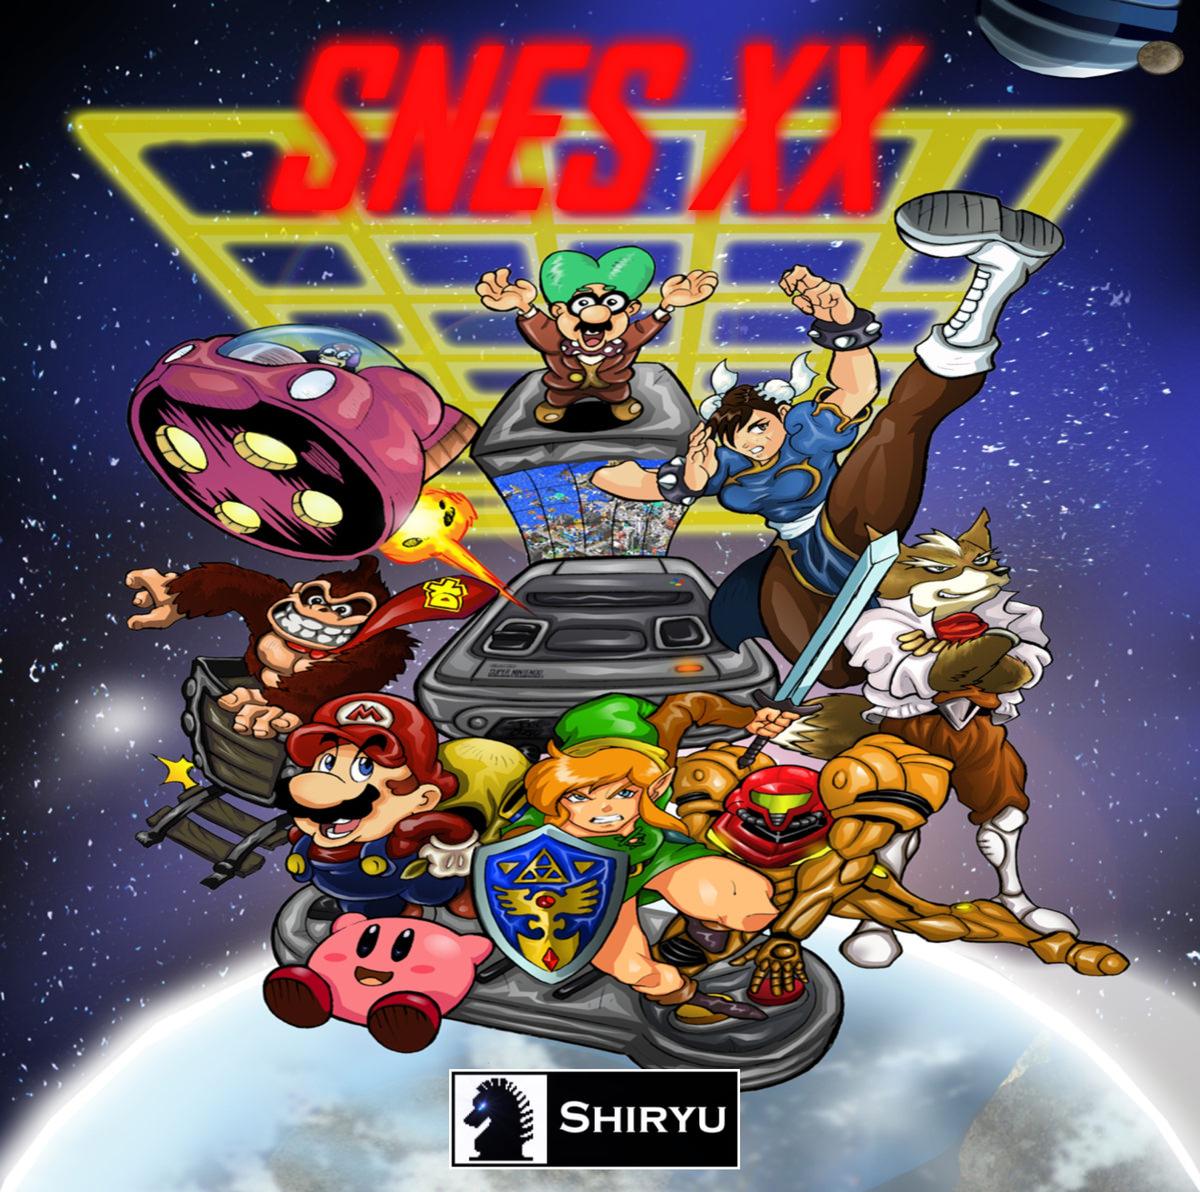 SNES-XX-Shiryu-video-game-music